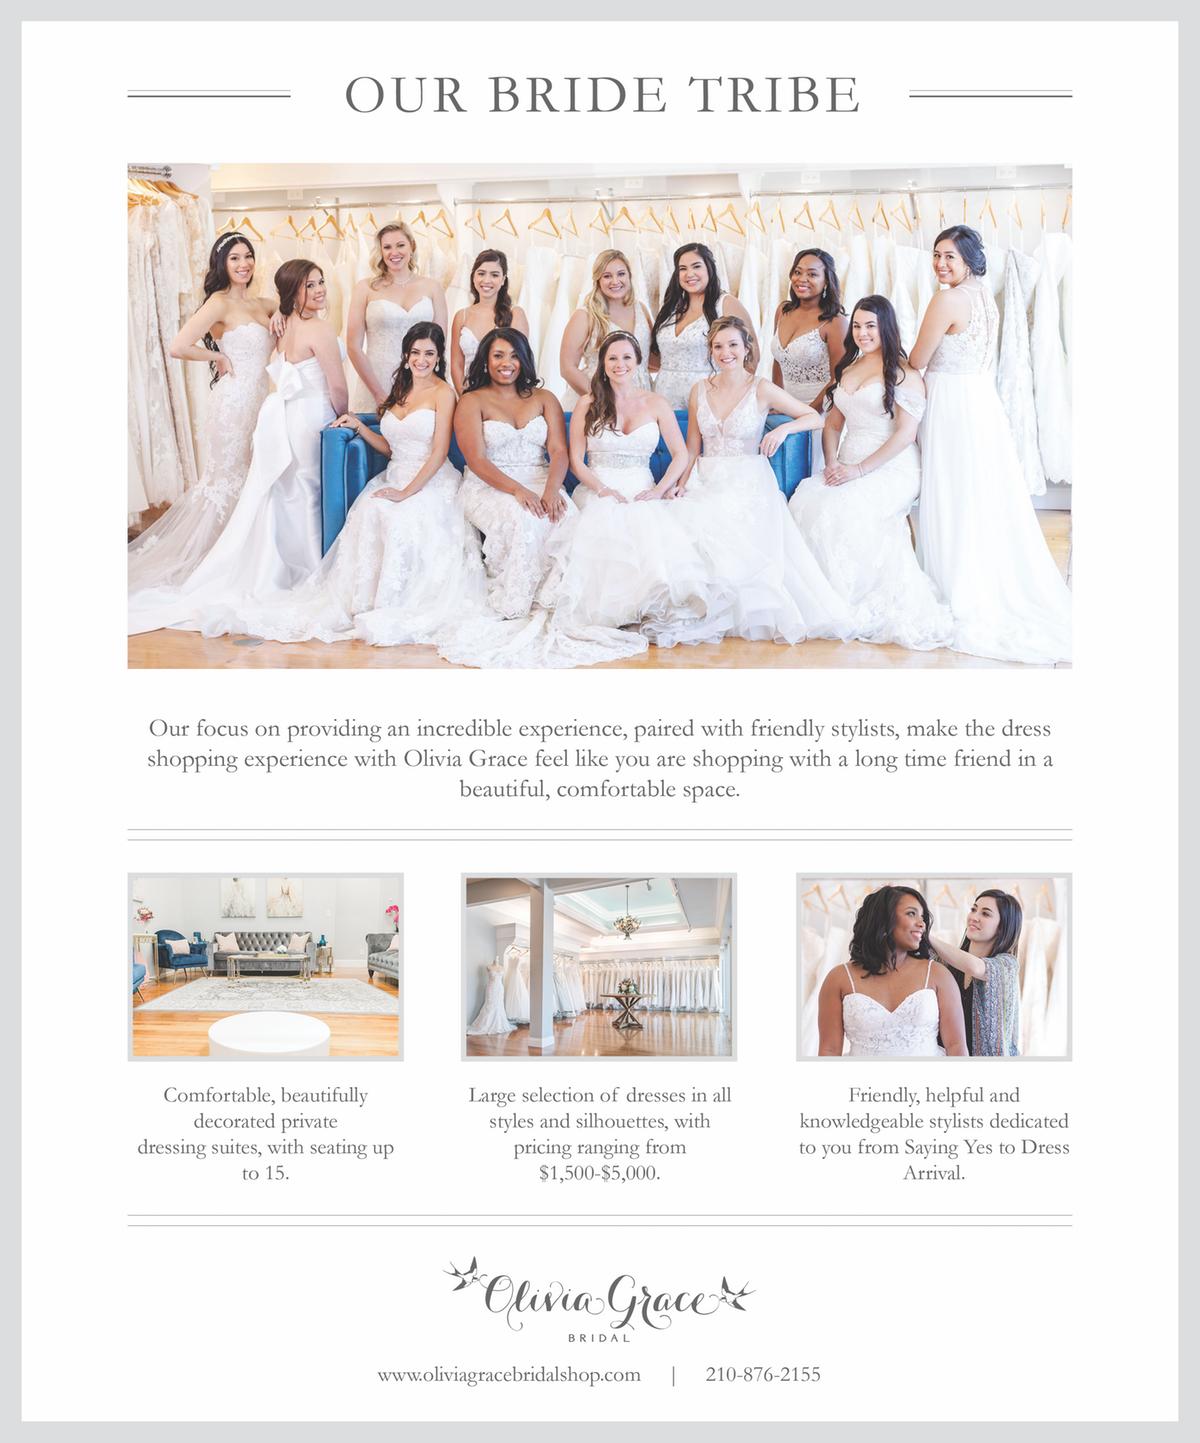 Quick Turnaround Needed: Bridal Print/Magazine Ad